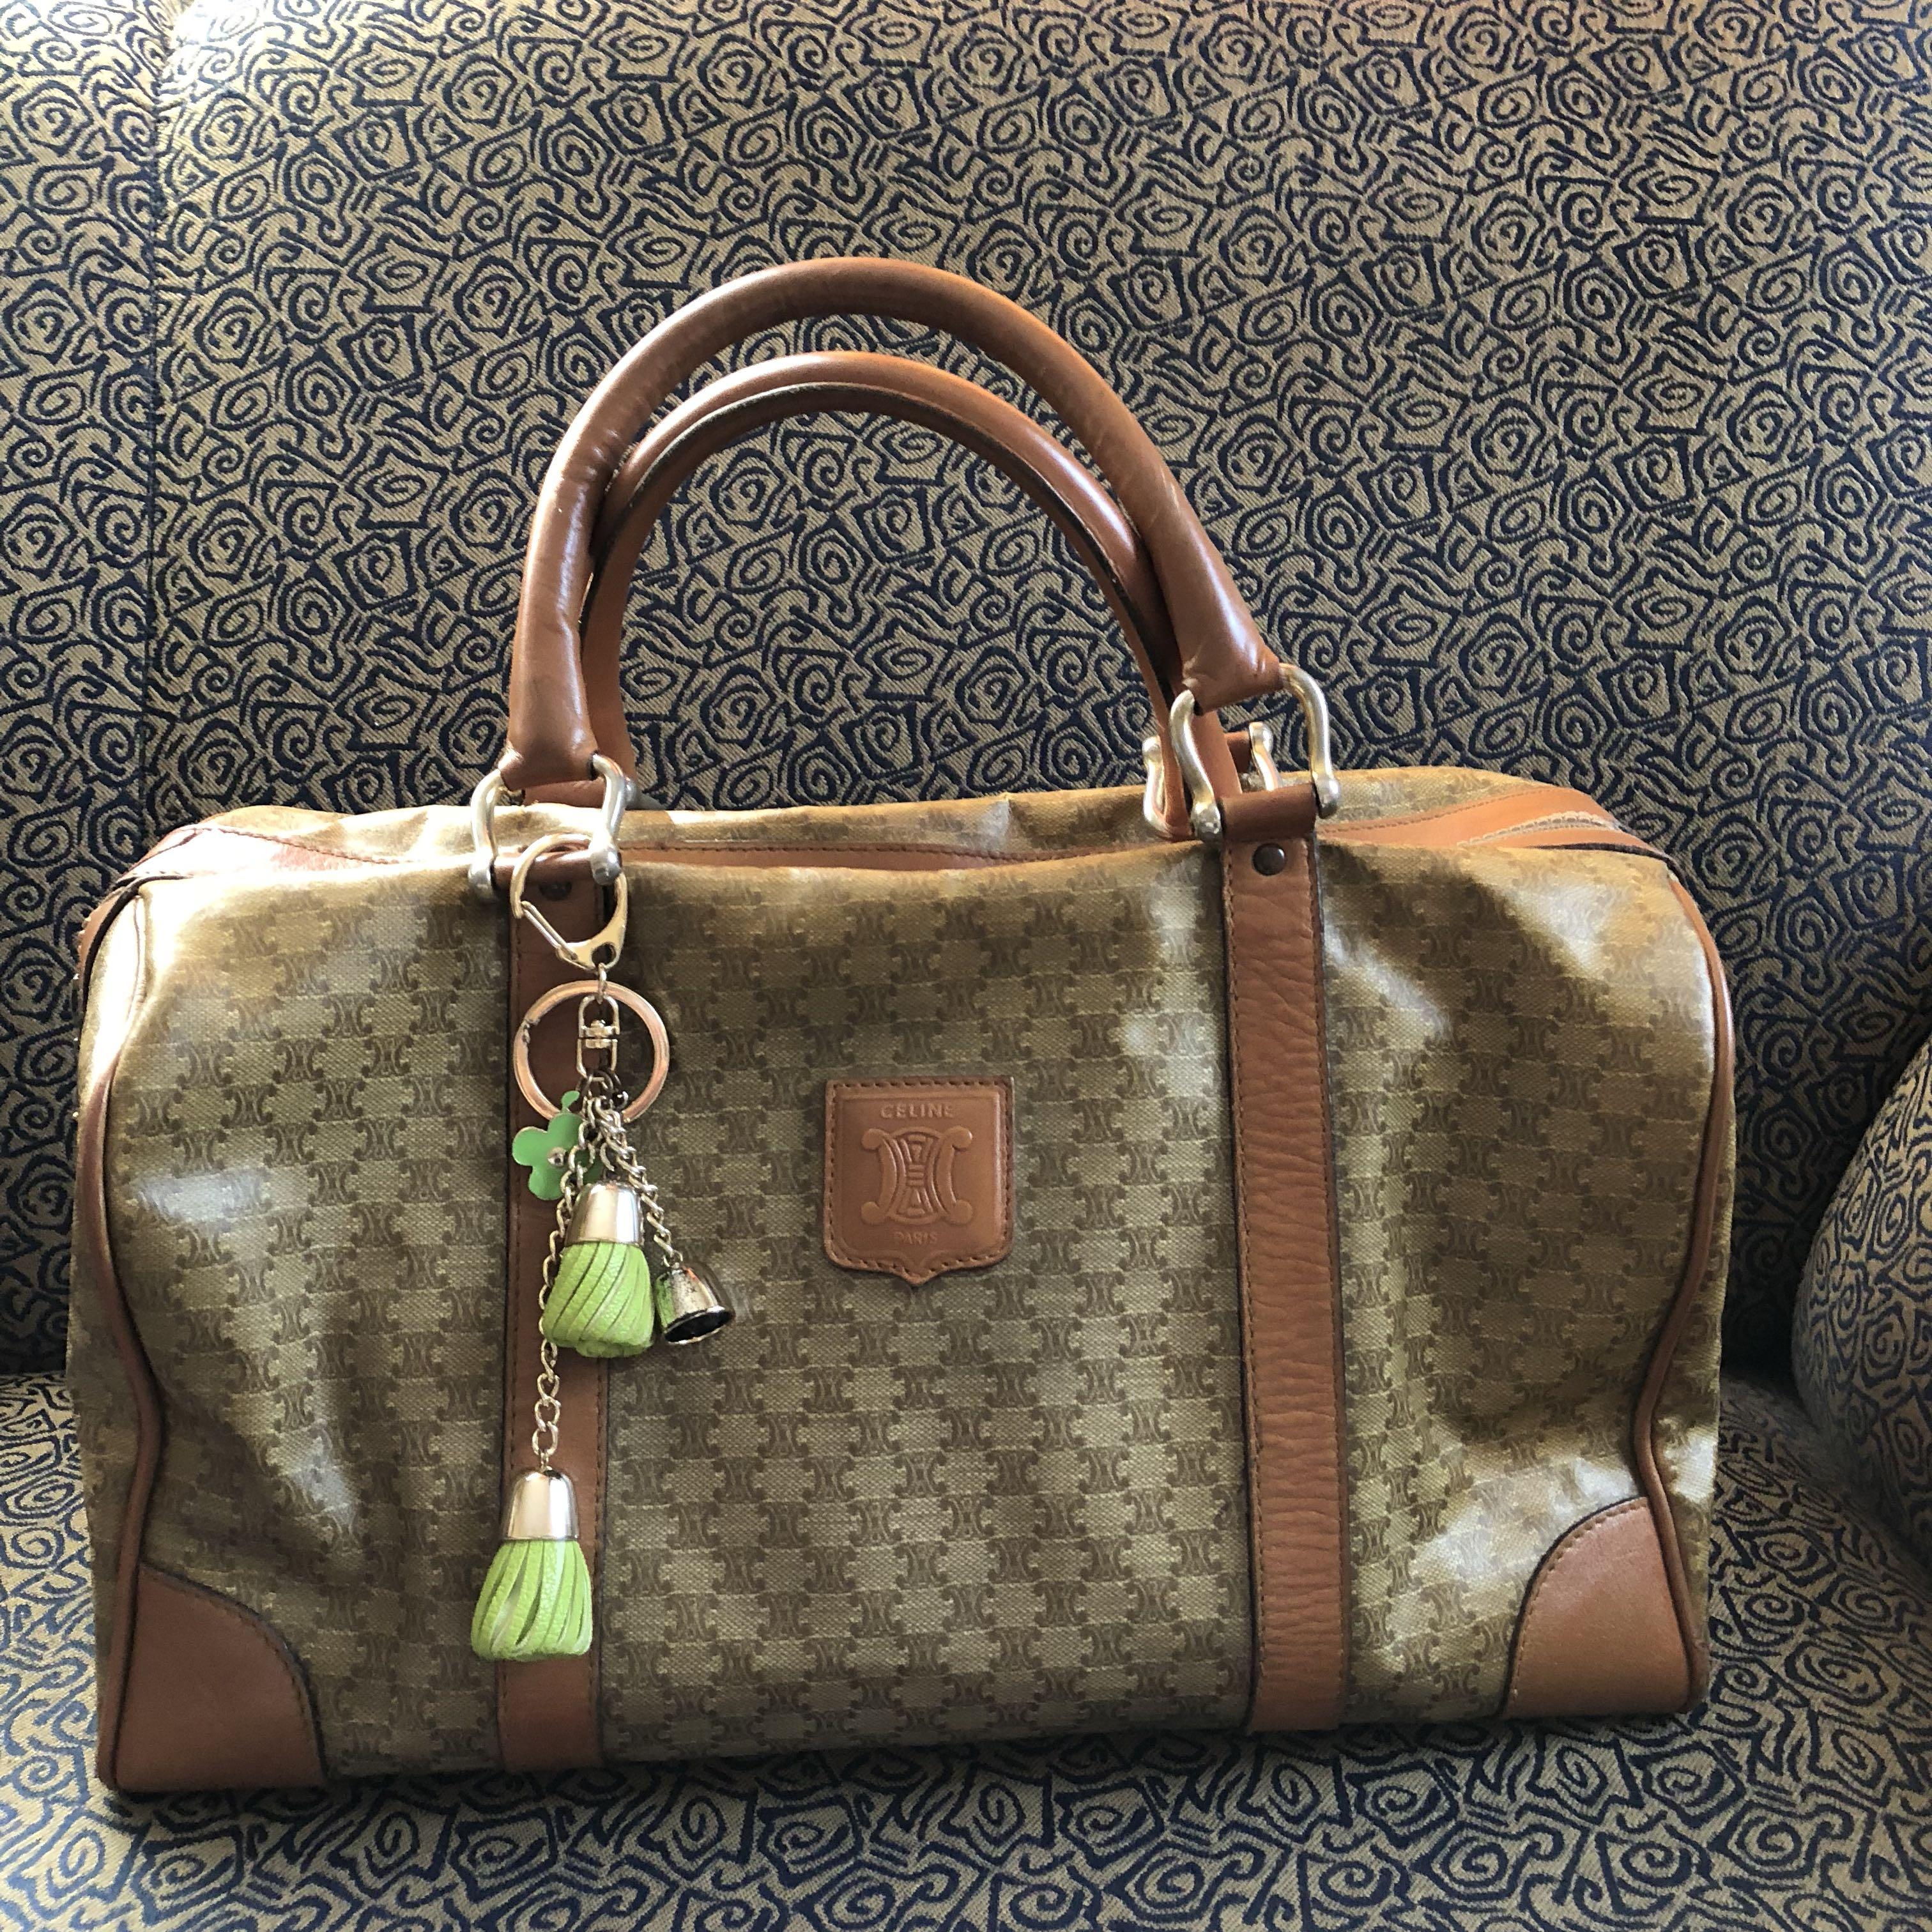 107df9a46f34 Vintage authentic celine boston bag women fashion bags wallets on carousell  jpg 3024x3024 Leather handbags celine